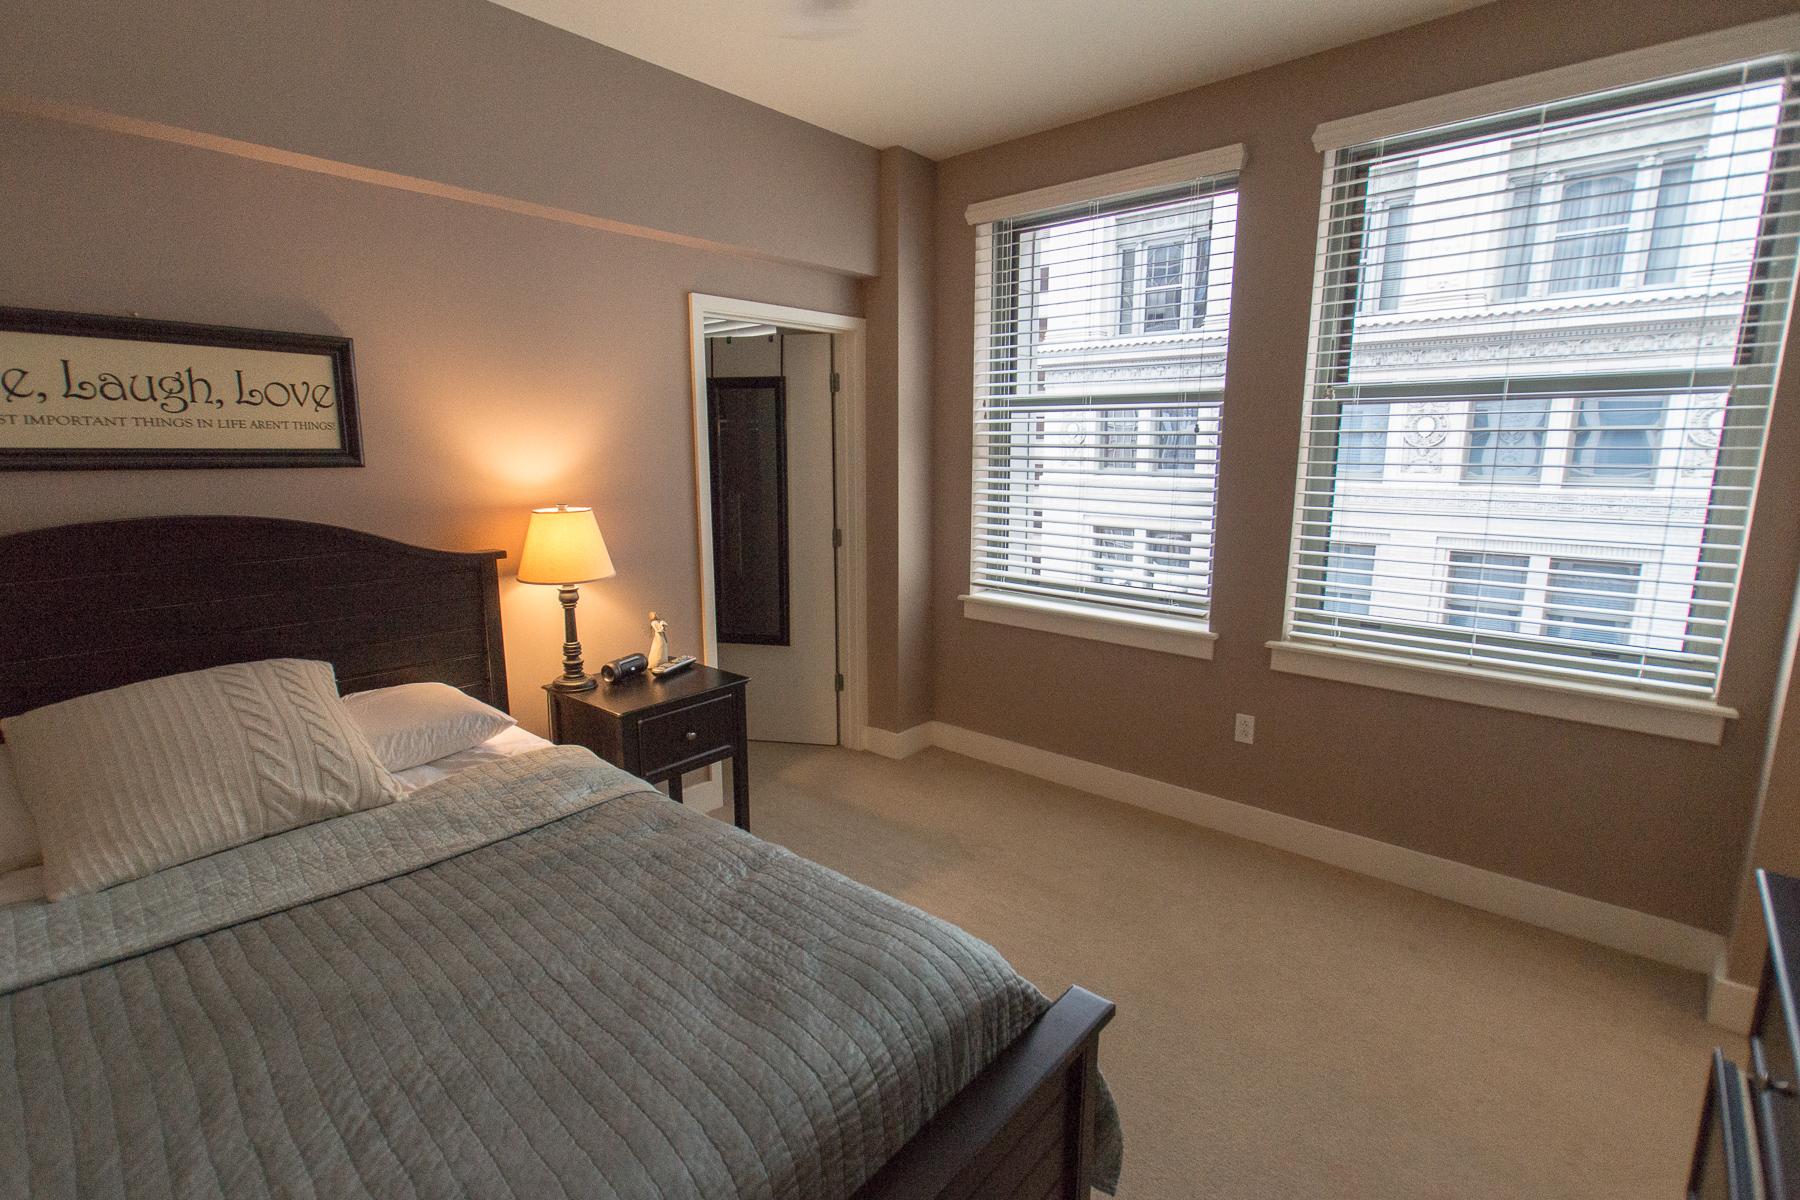 Condominium for Sale at N Broadway 1606 314 N Broadway #1606 St. Louis, Missouri 63102 United States